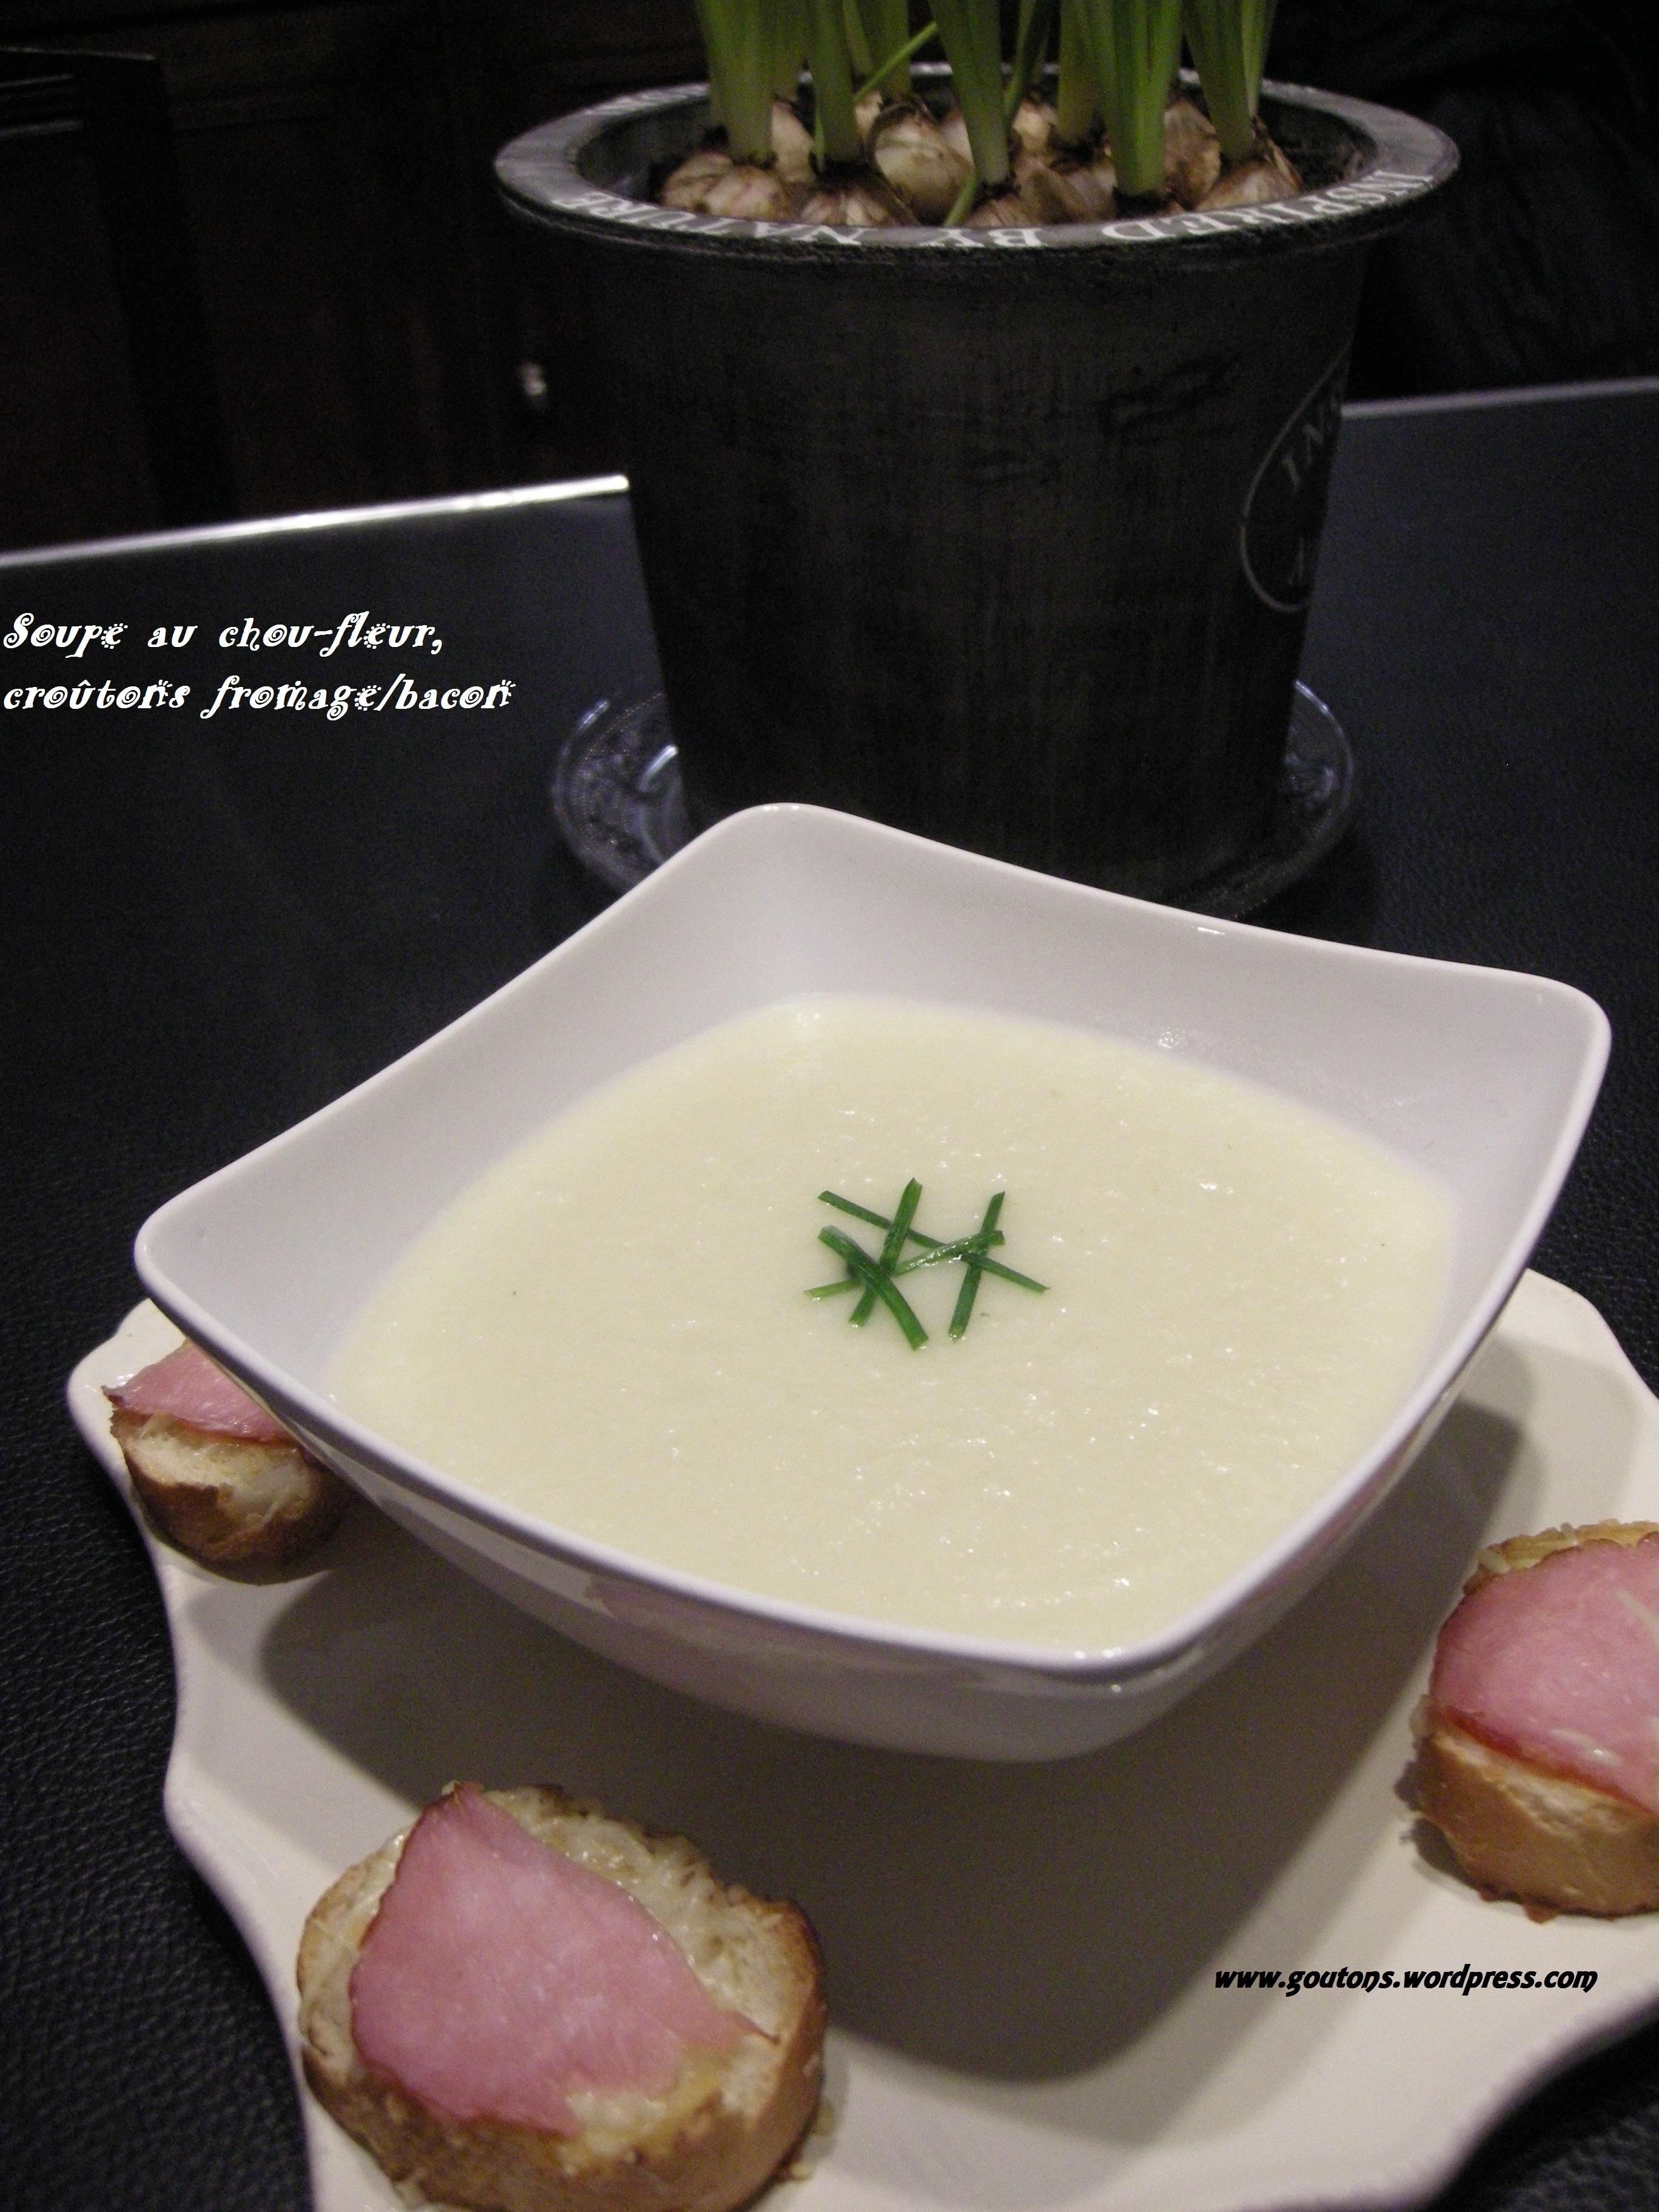 Soupe au chou-fleur, croûtons fromage/bacon